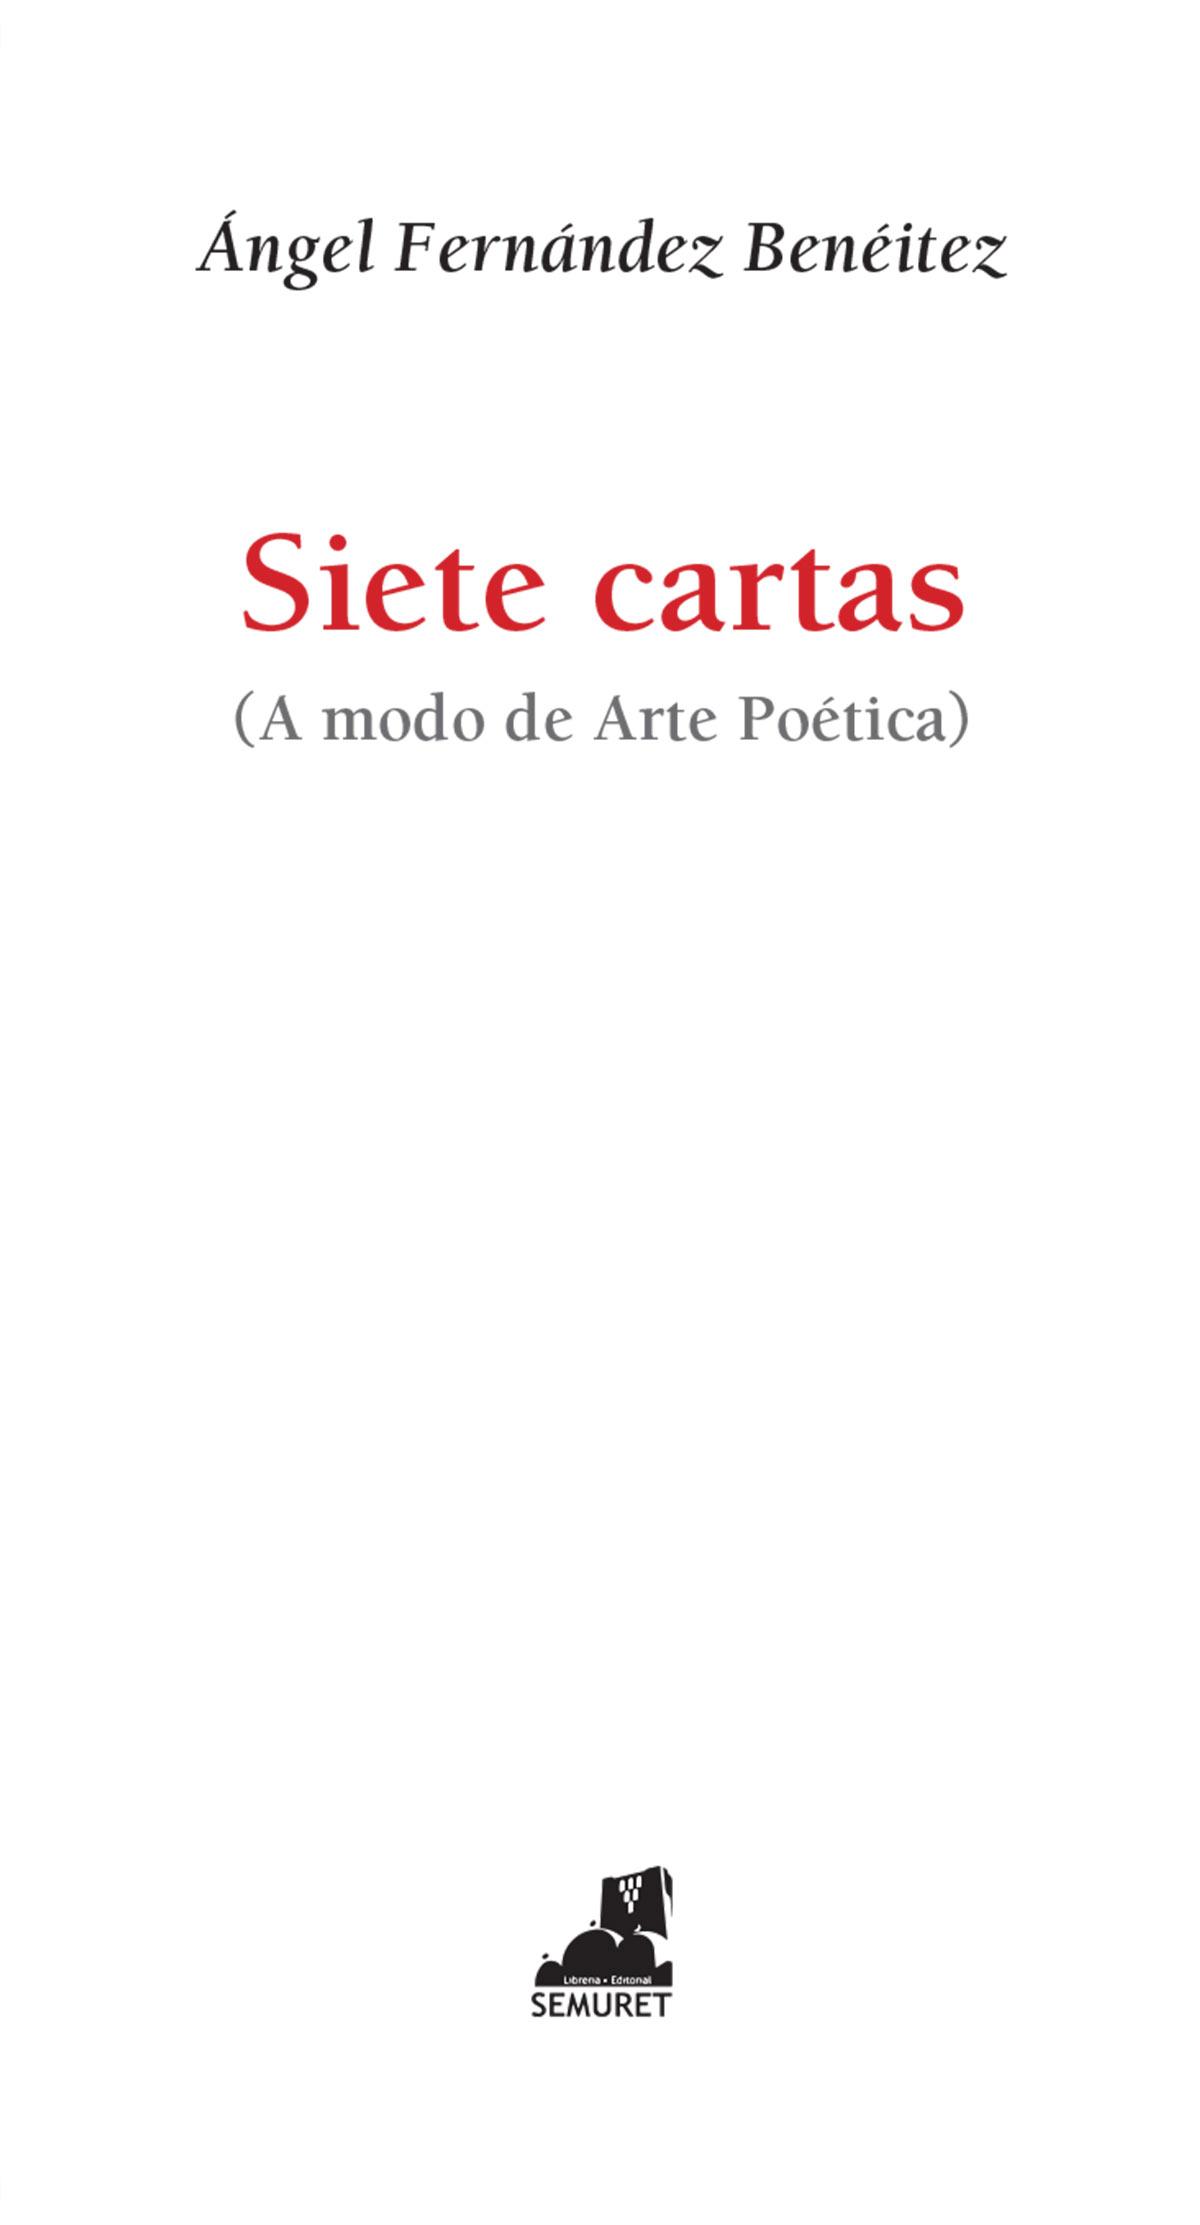 poesia Siete cartas Ángel Fernandéz Benéitez editorial Semuret zamora